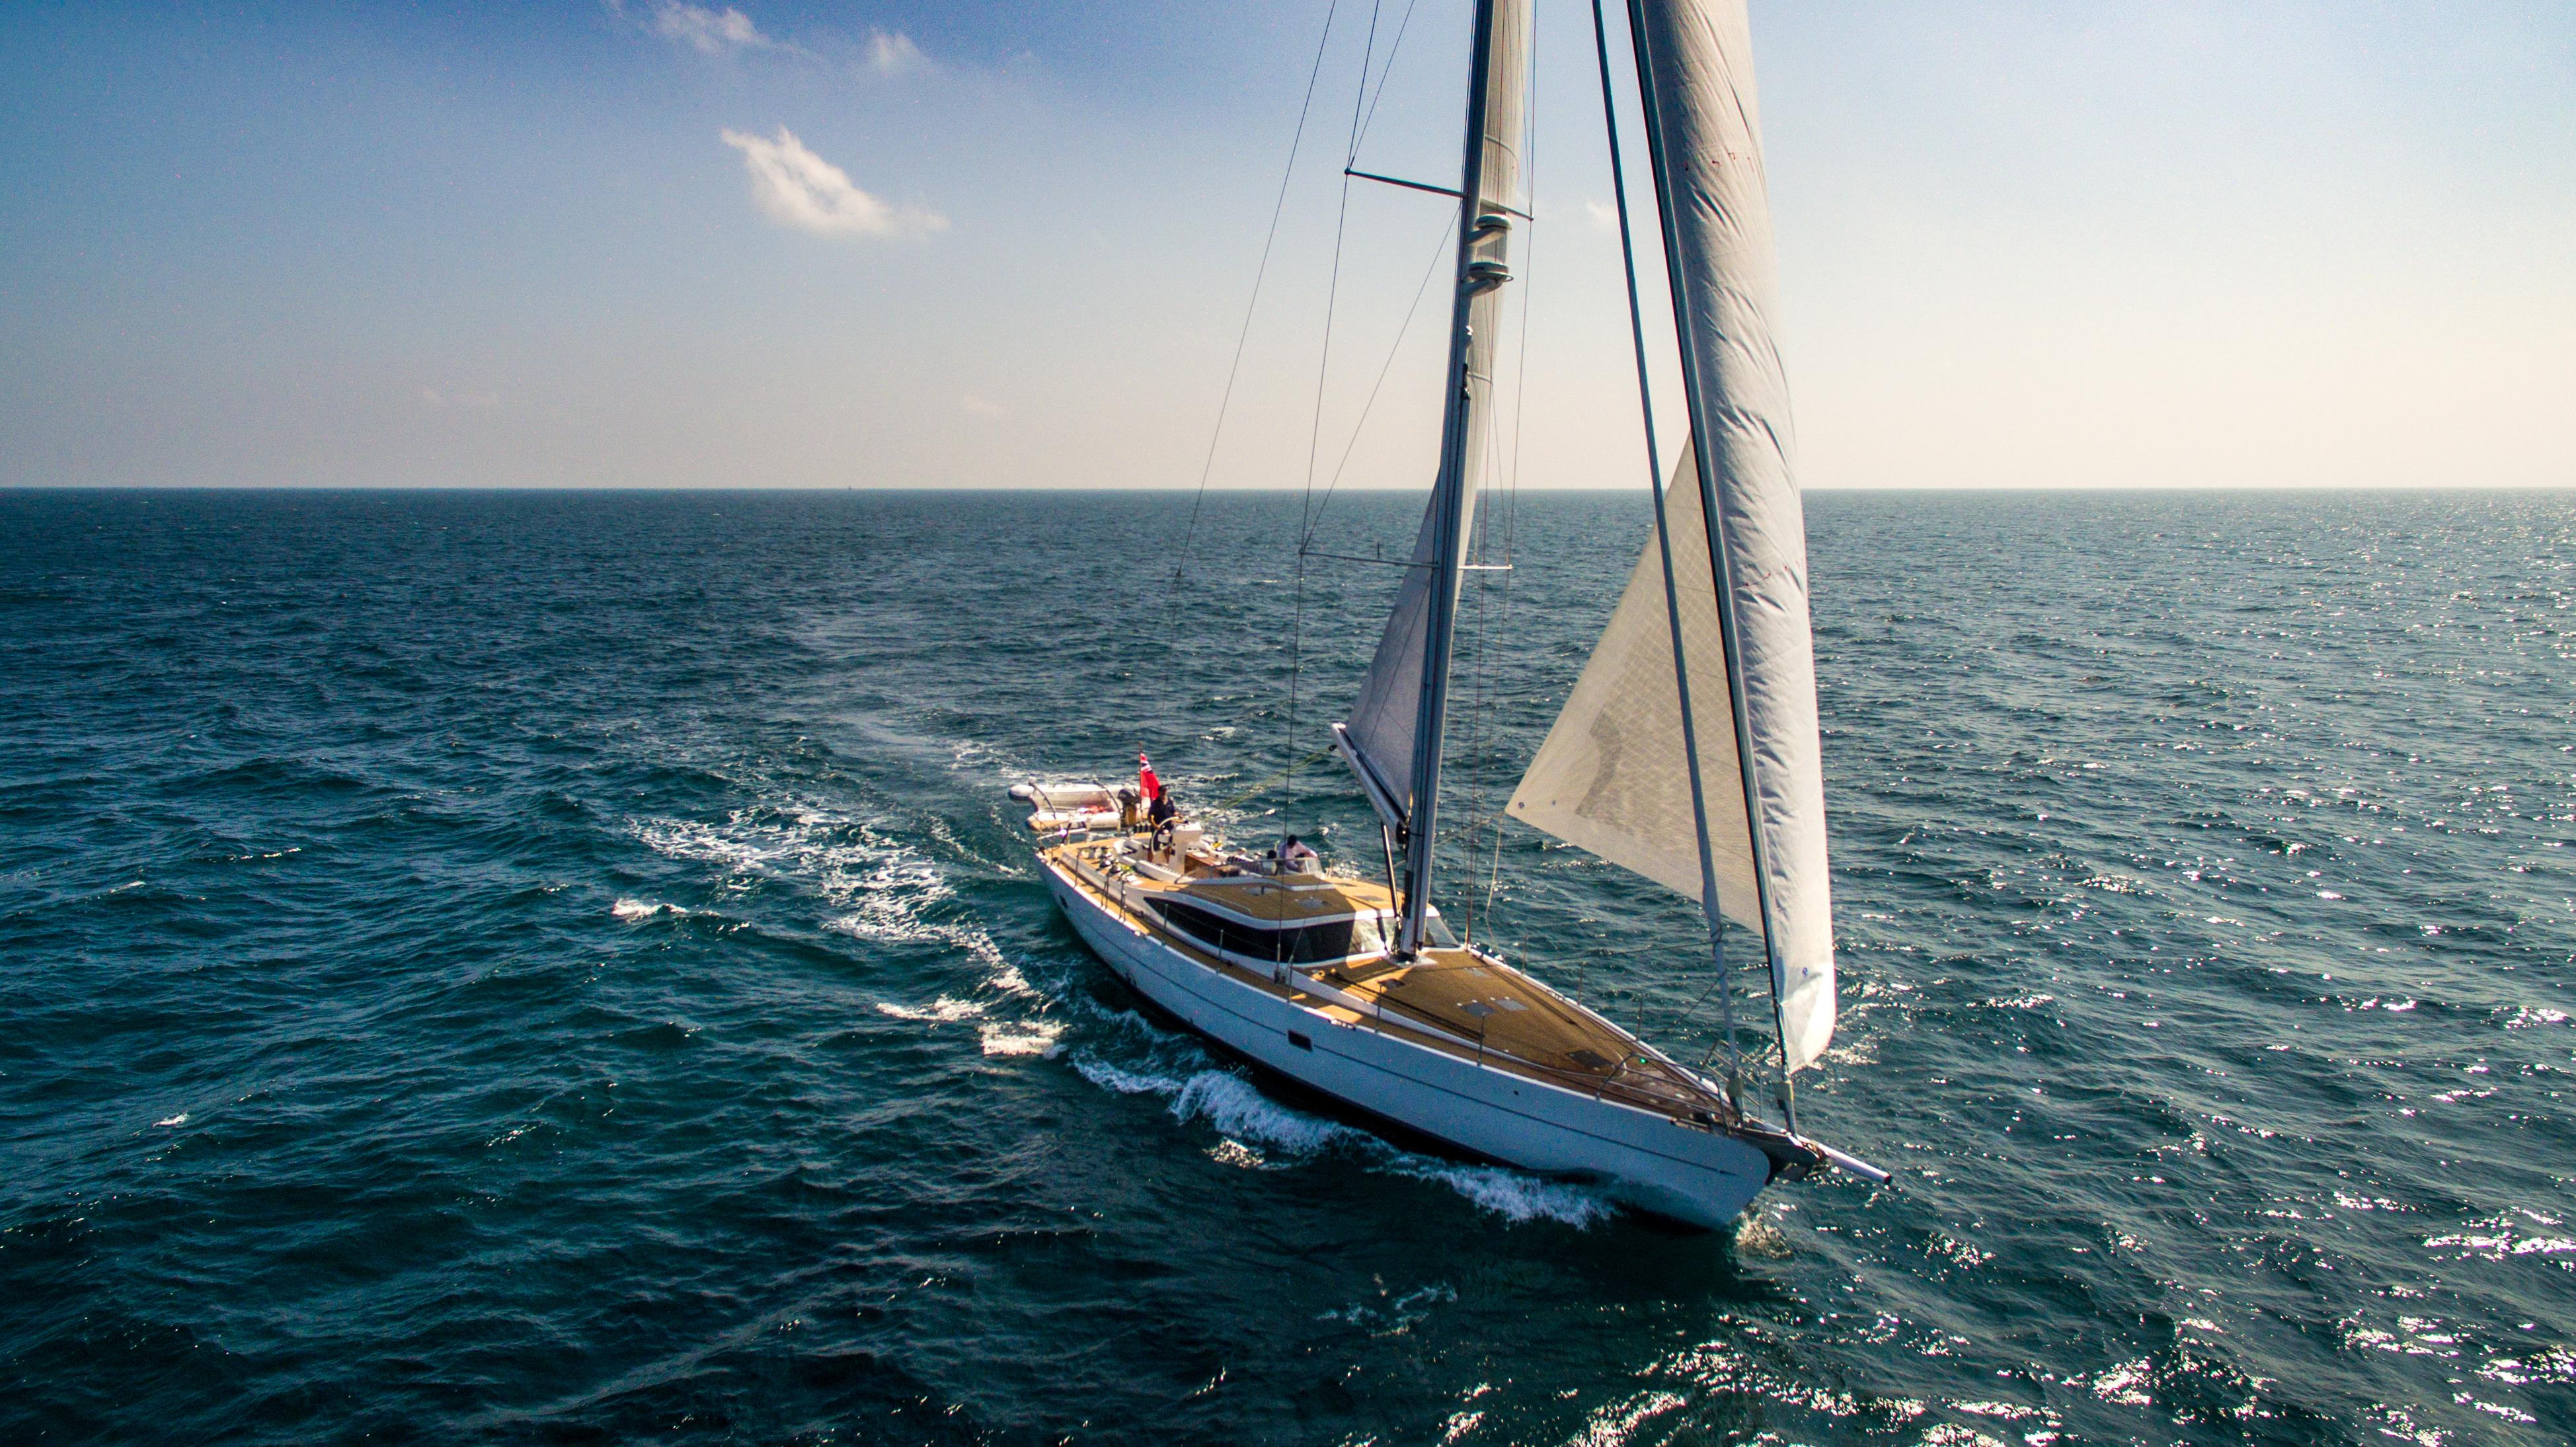 Kraken Yachts | 66 ft Sailing Yacht | K66 Yacht